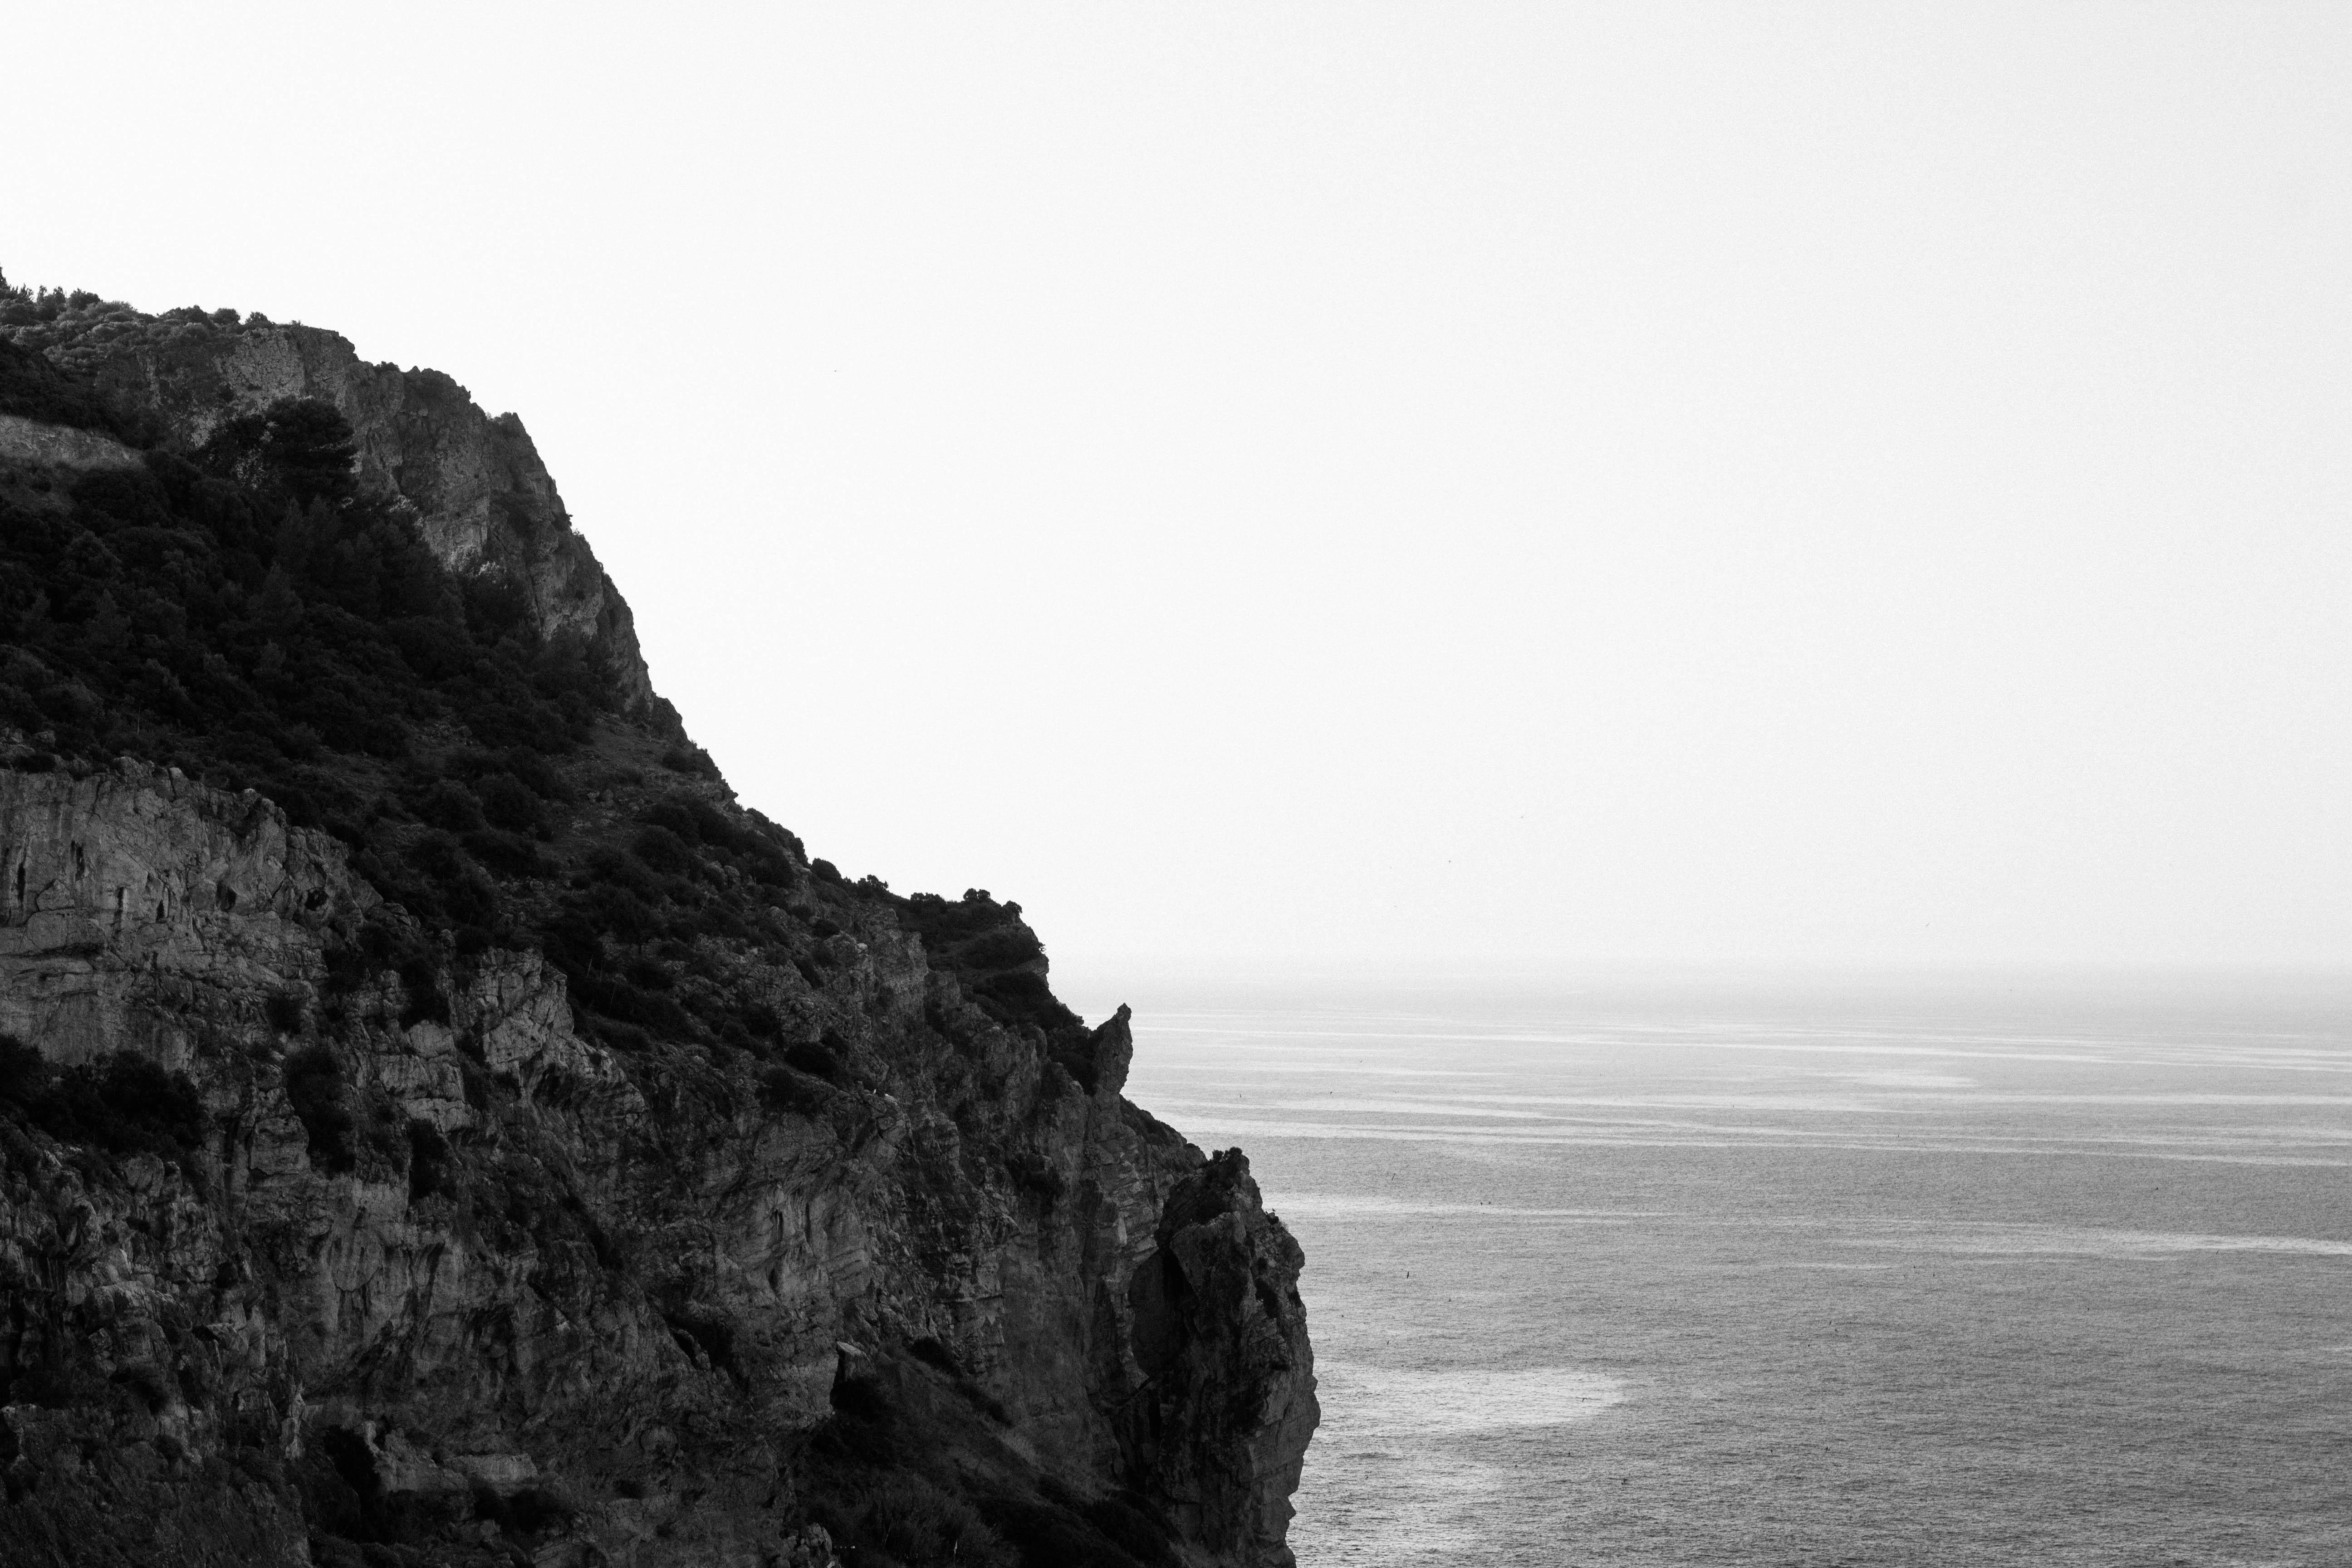 Cliff, sea, cliff, rocks, cliffs, white and black